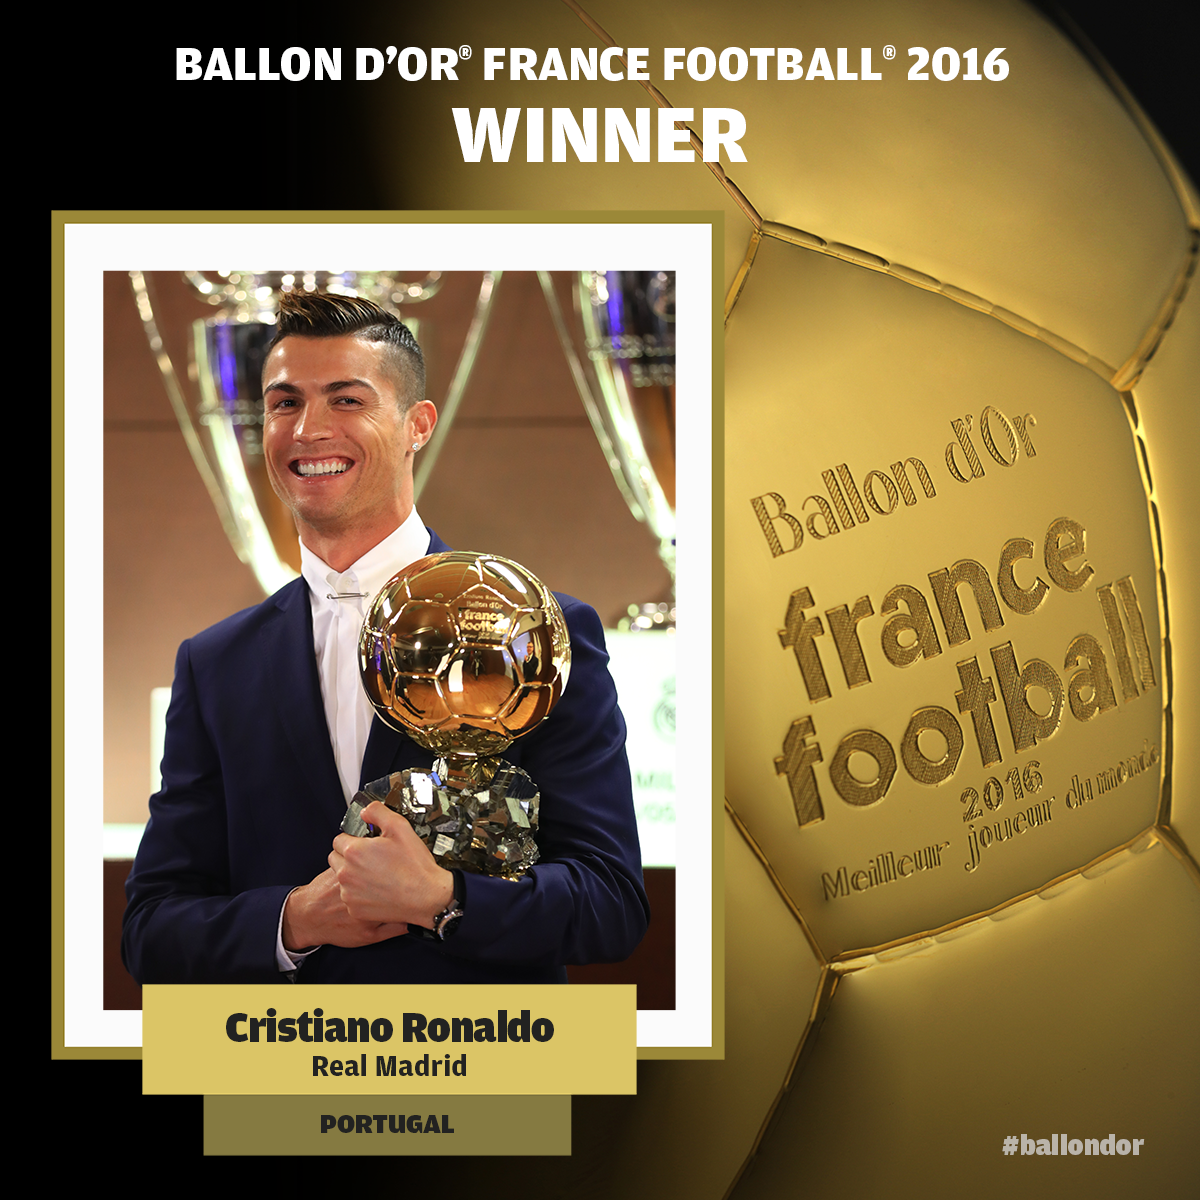 Ronaldo ze Złotą Piłką, Messi drugi